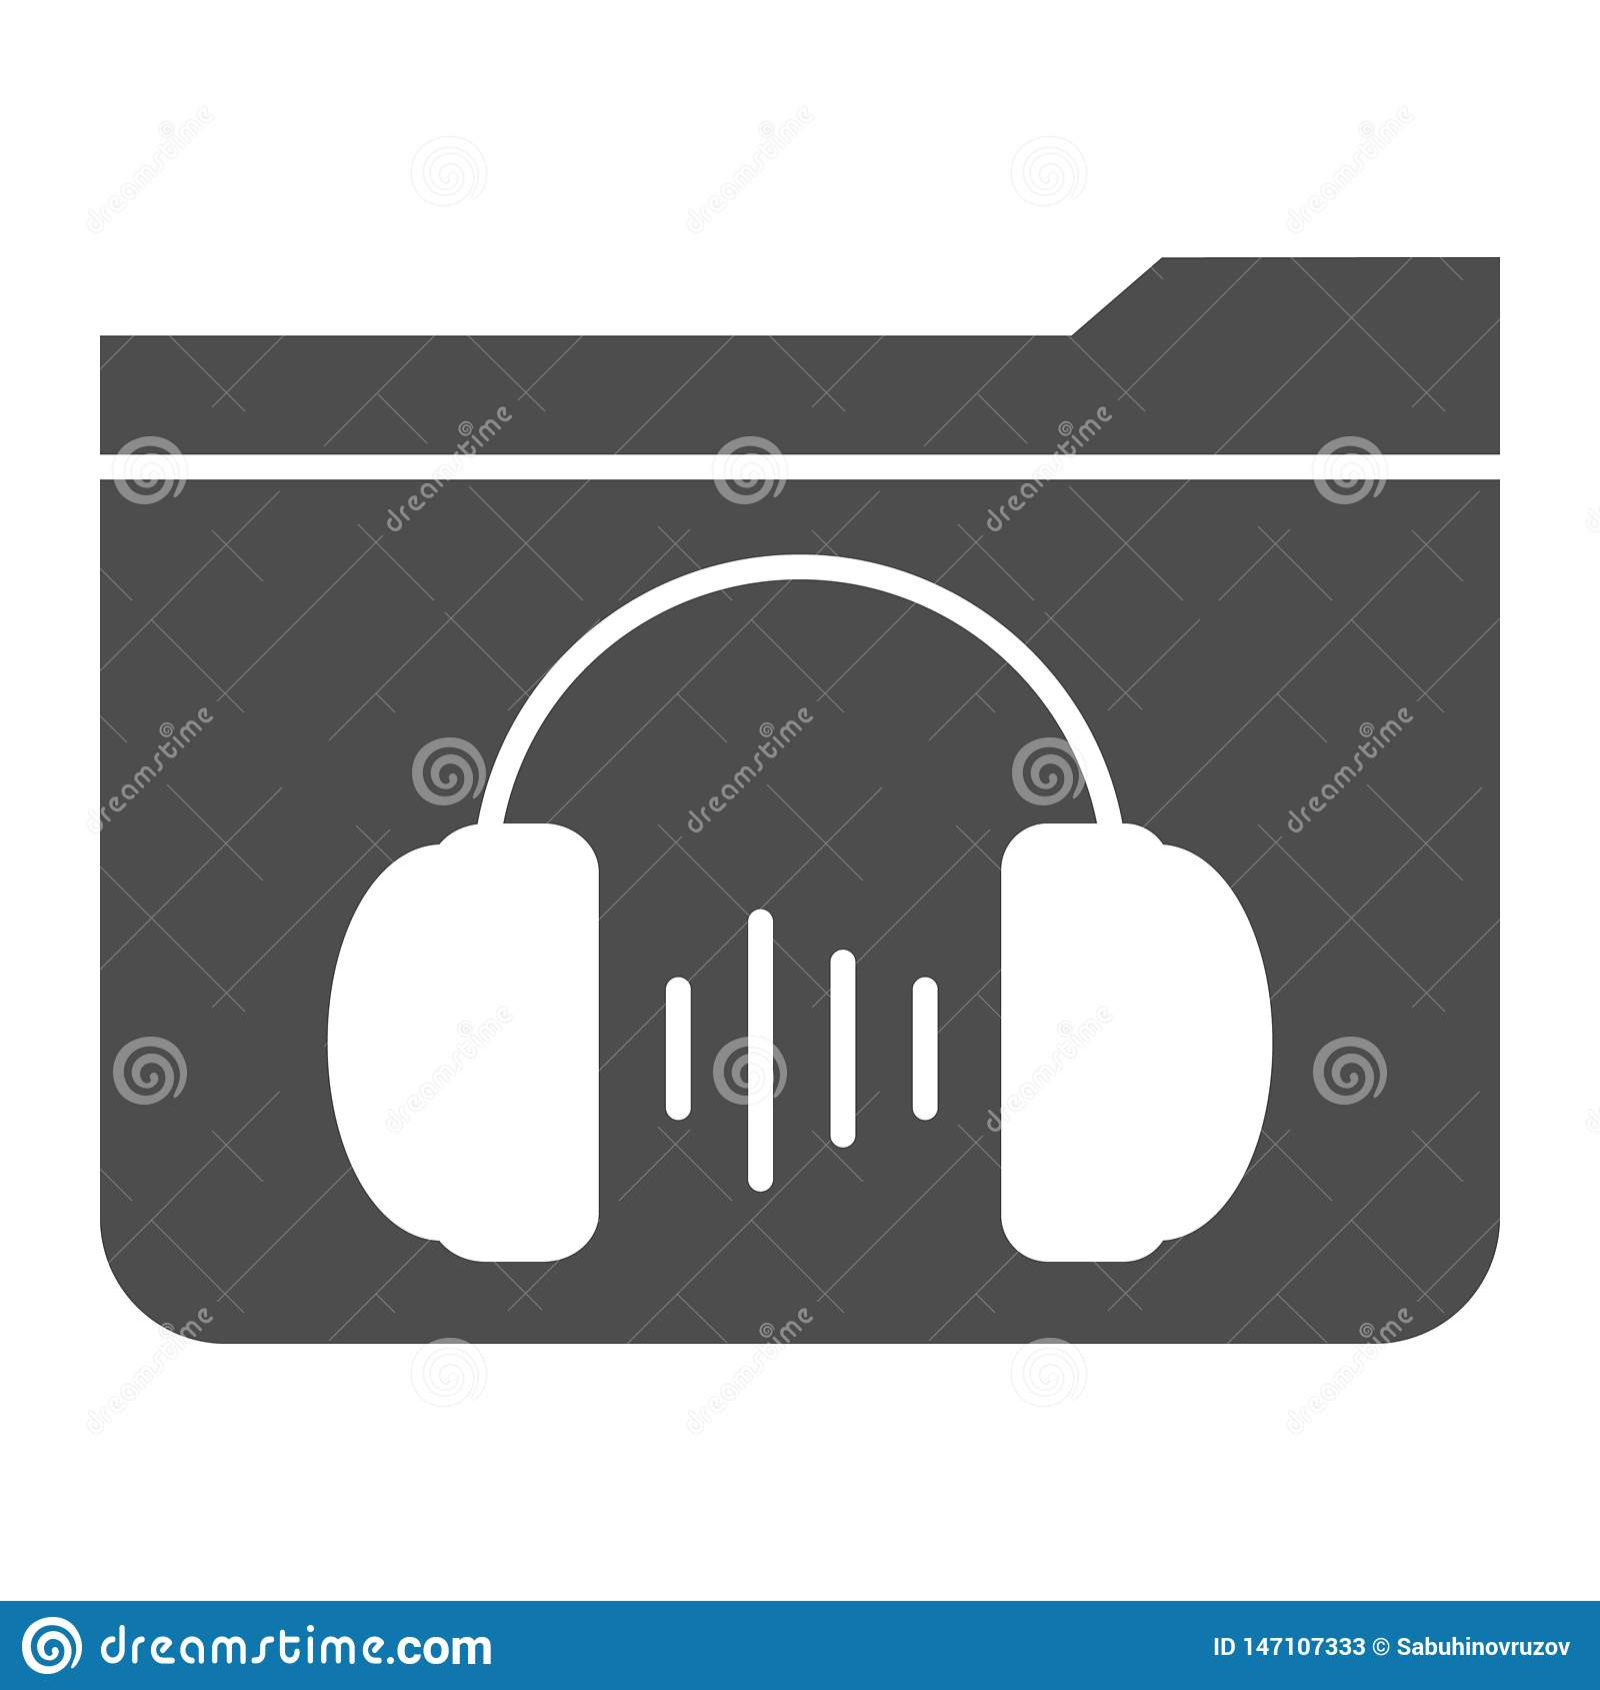 Feste Ikone des Musikordners r Ordner mit Kopfhörer Glyph-Artentwurf